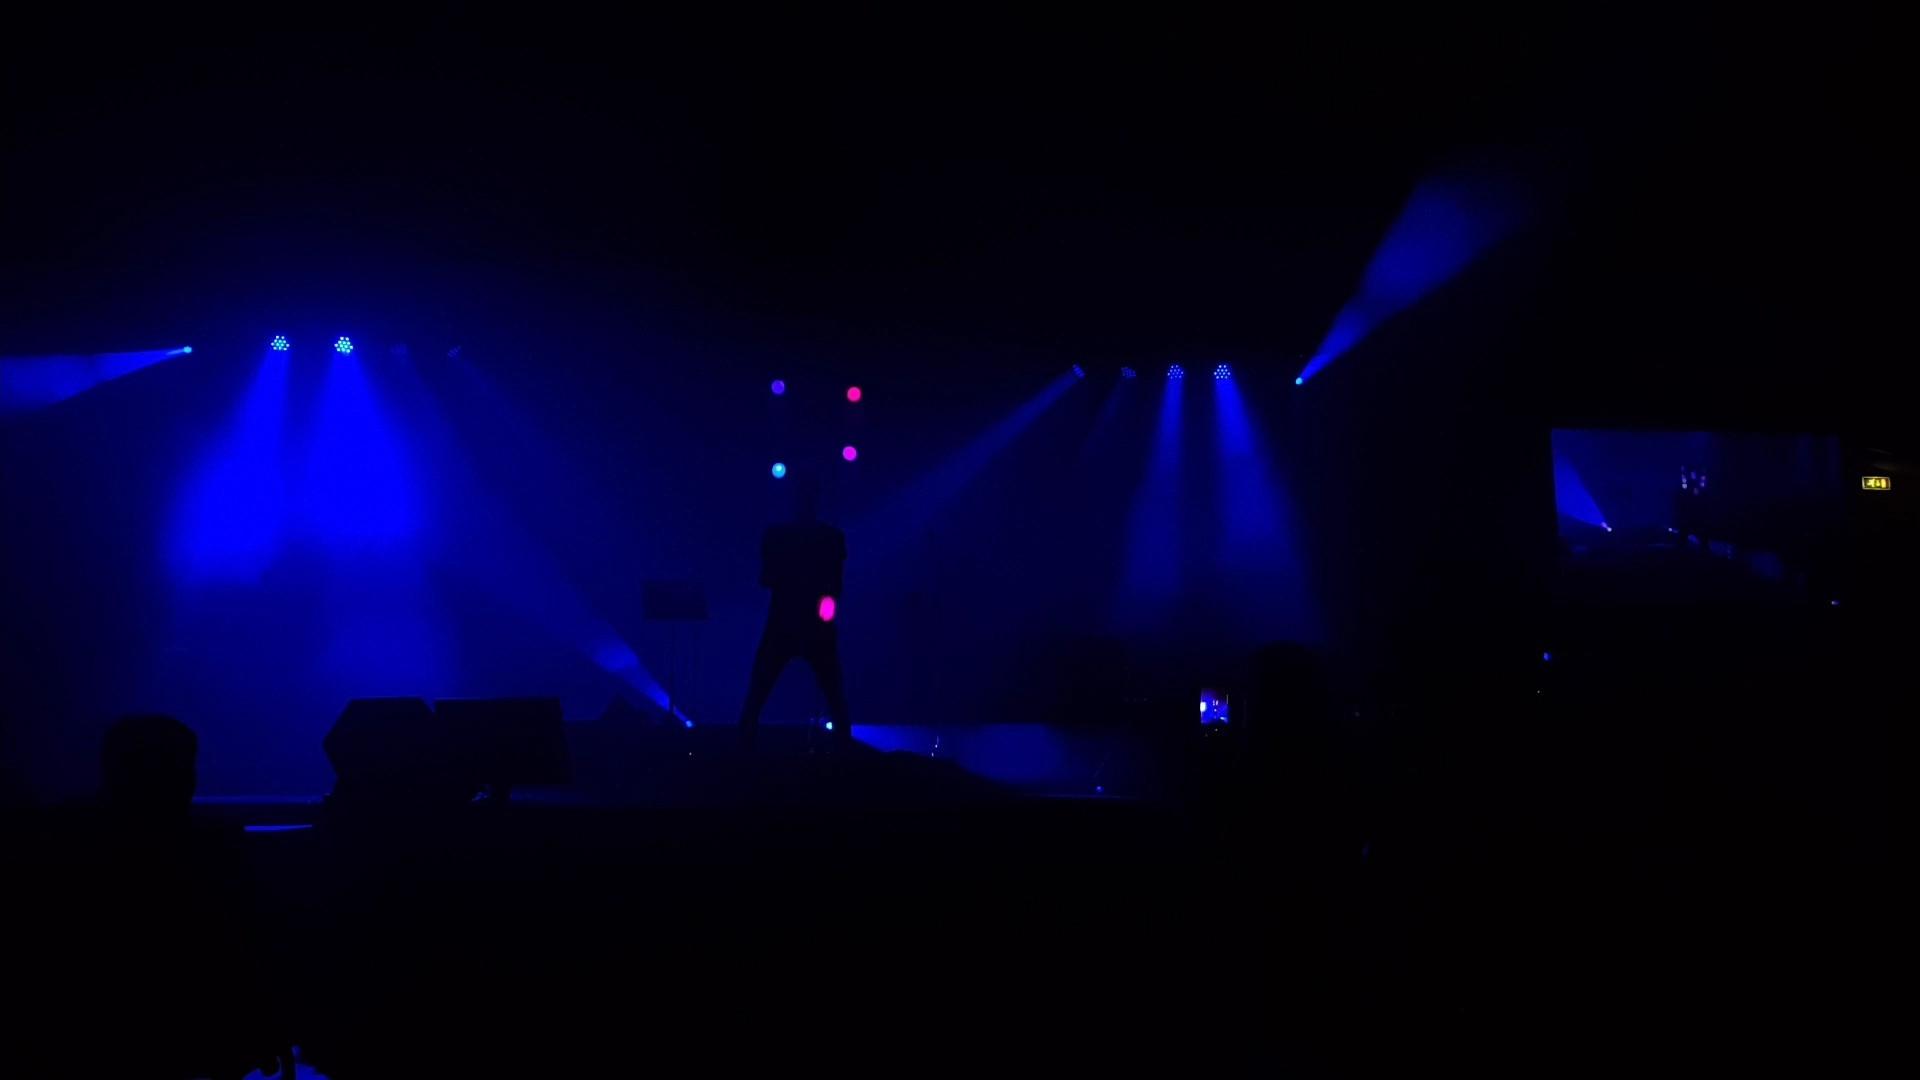 Light-act 1.0